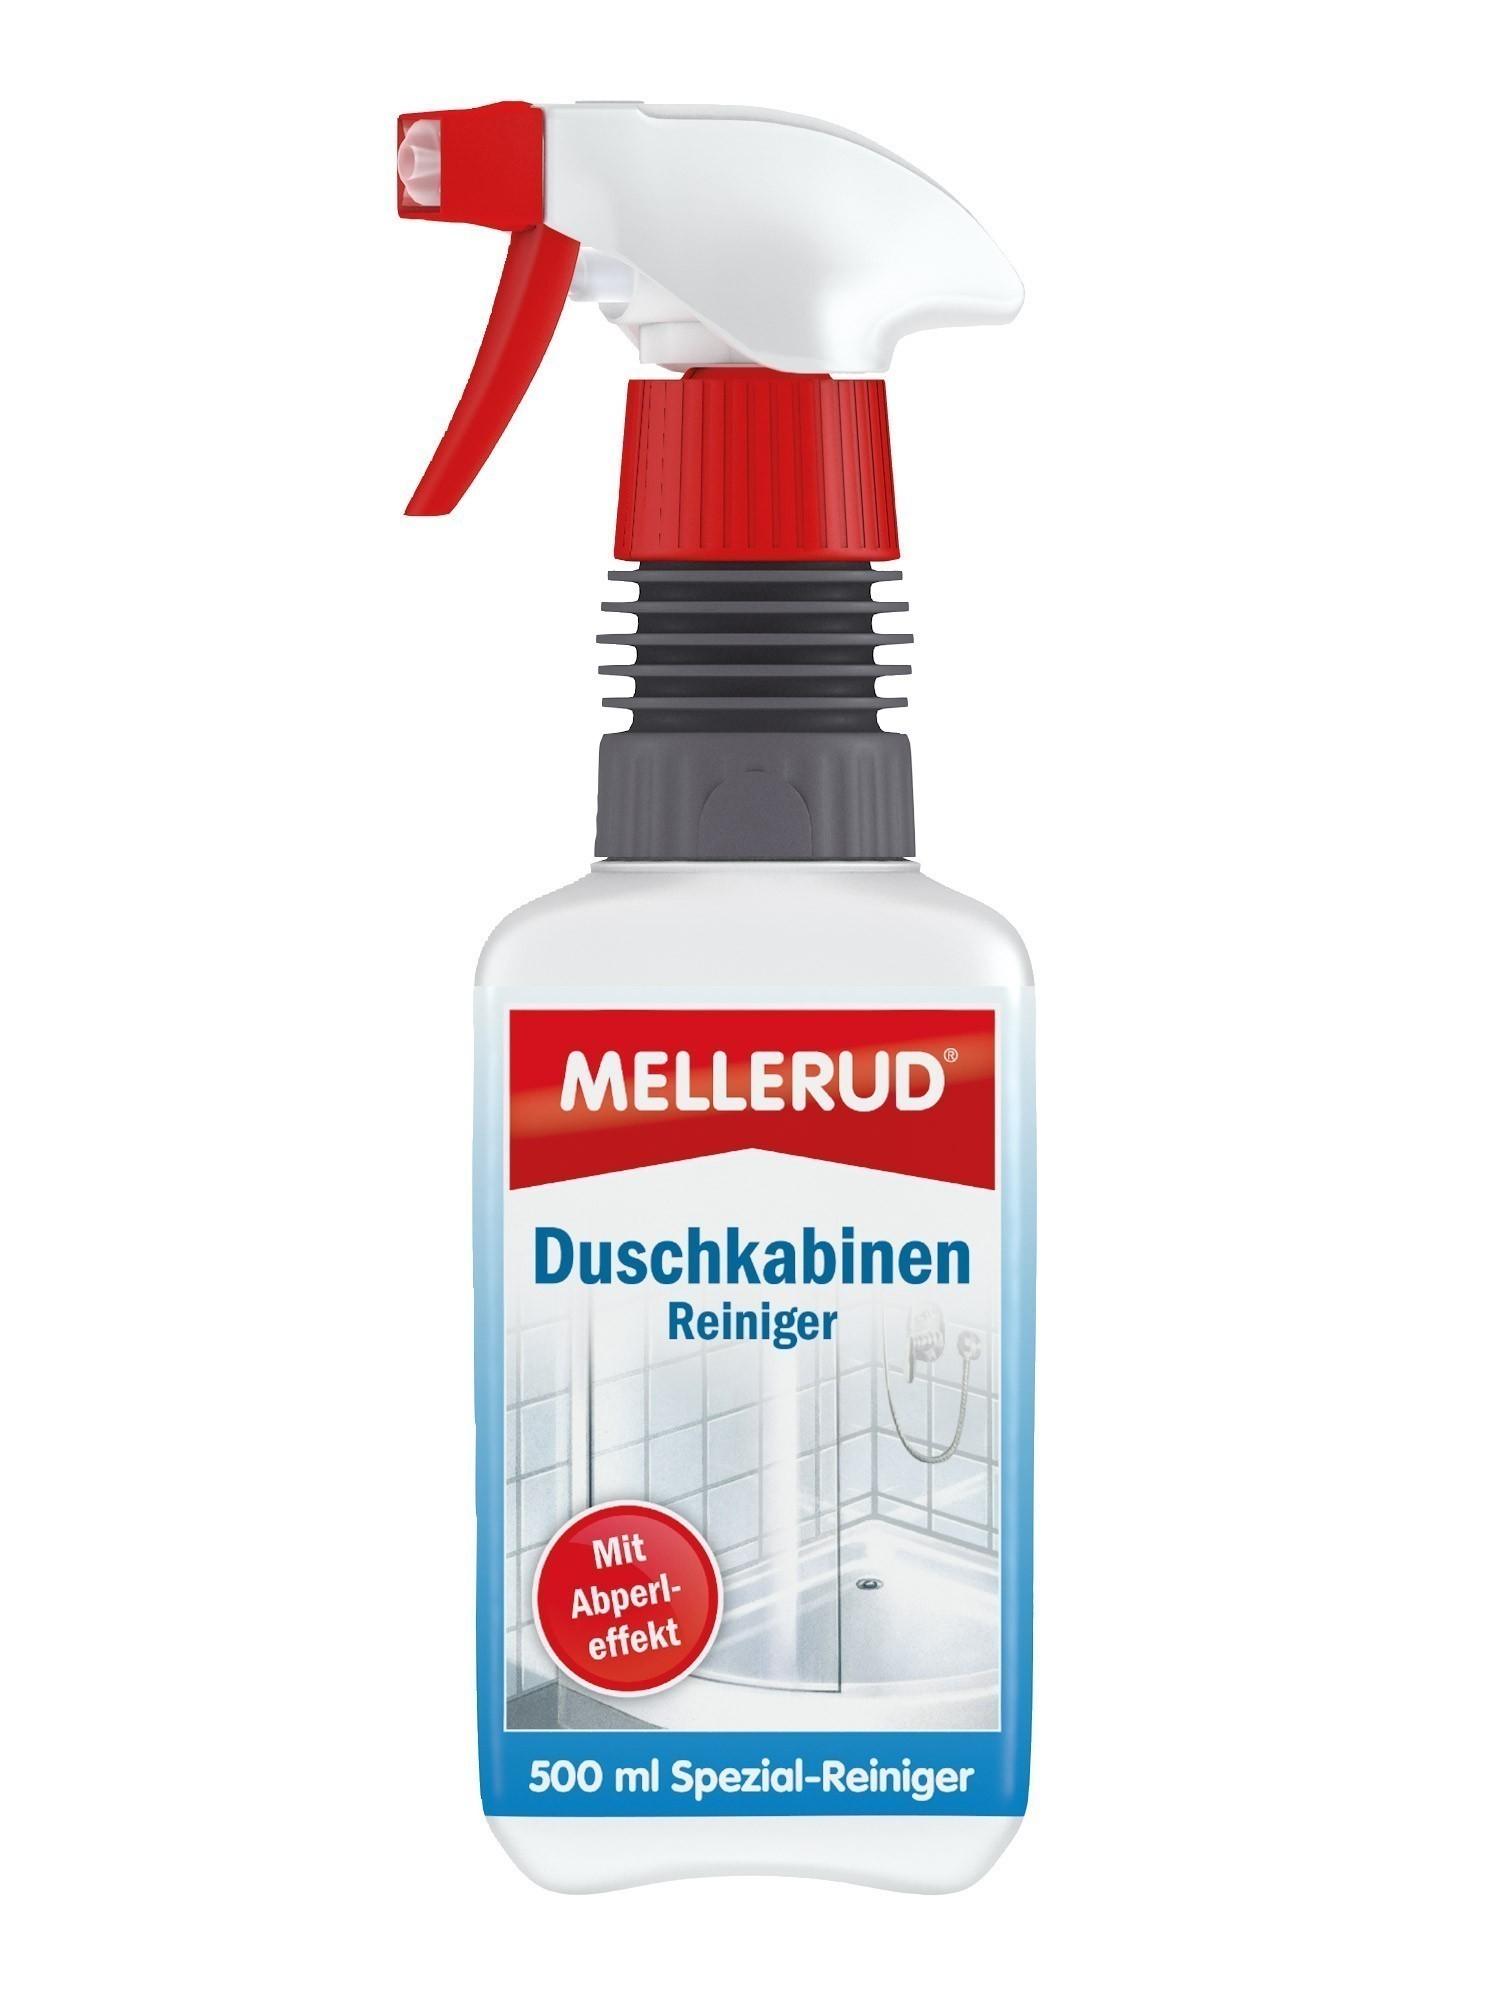 MELLERUD Duschkabinen Reiniger 0,5 Liter Bild 1